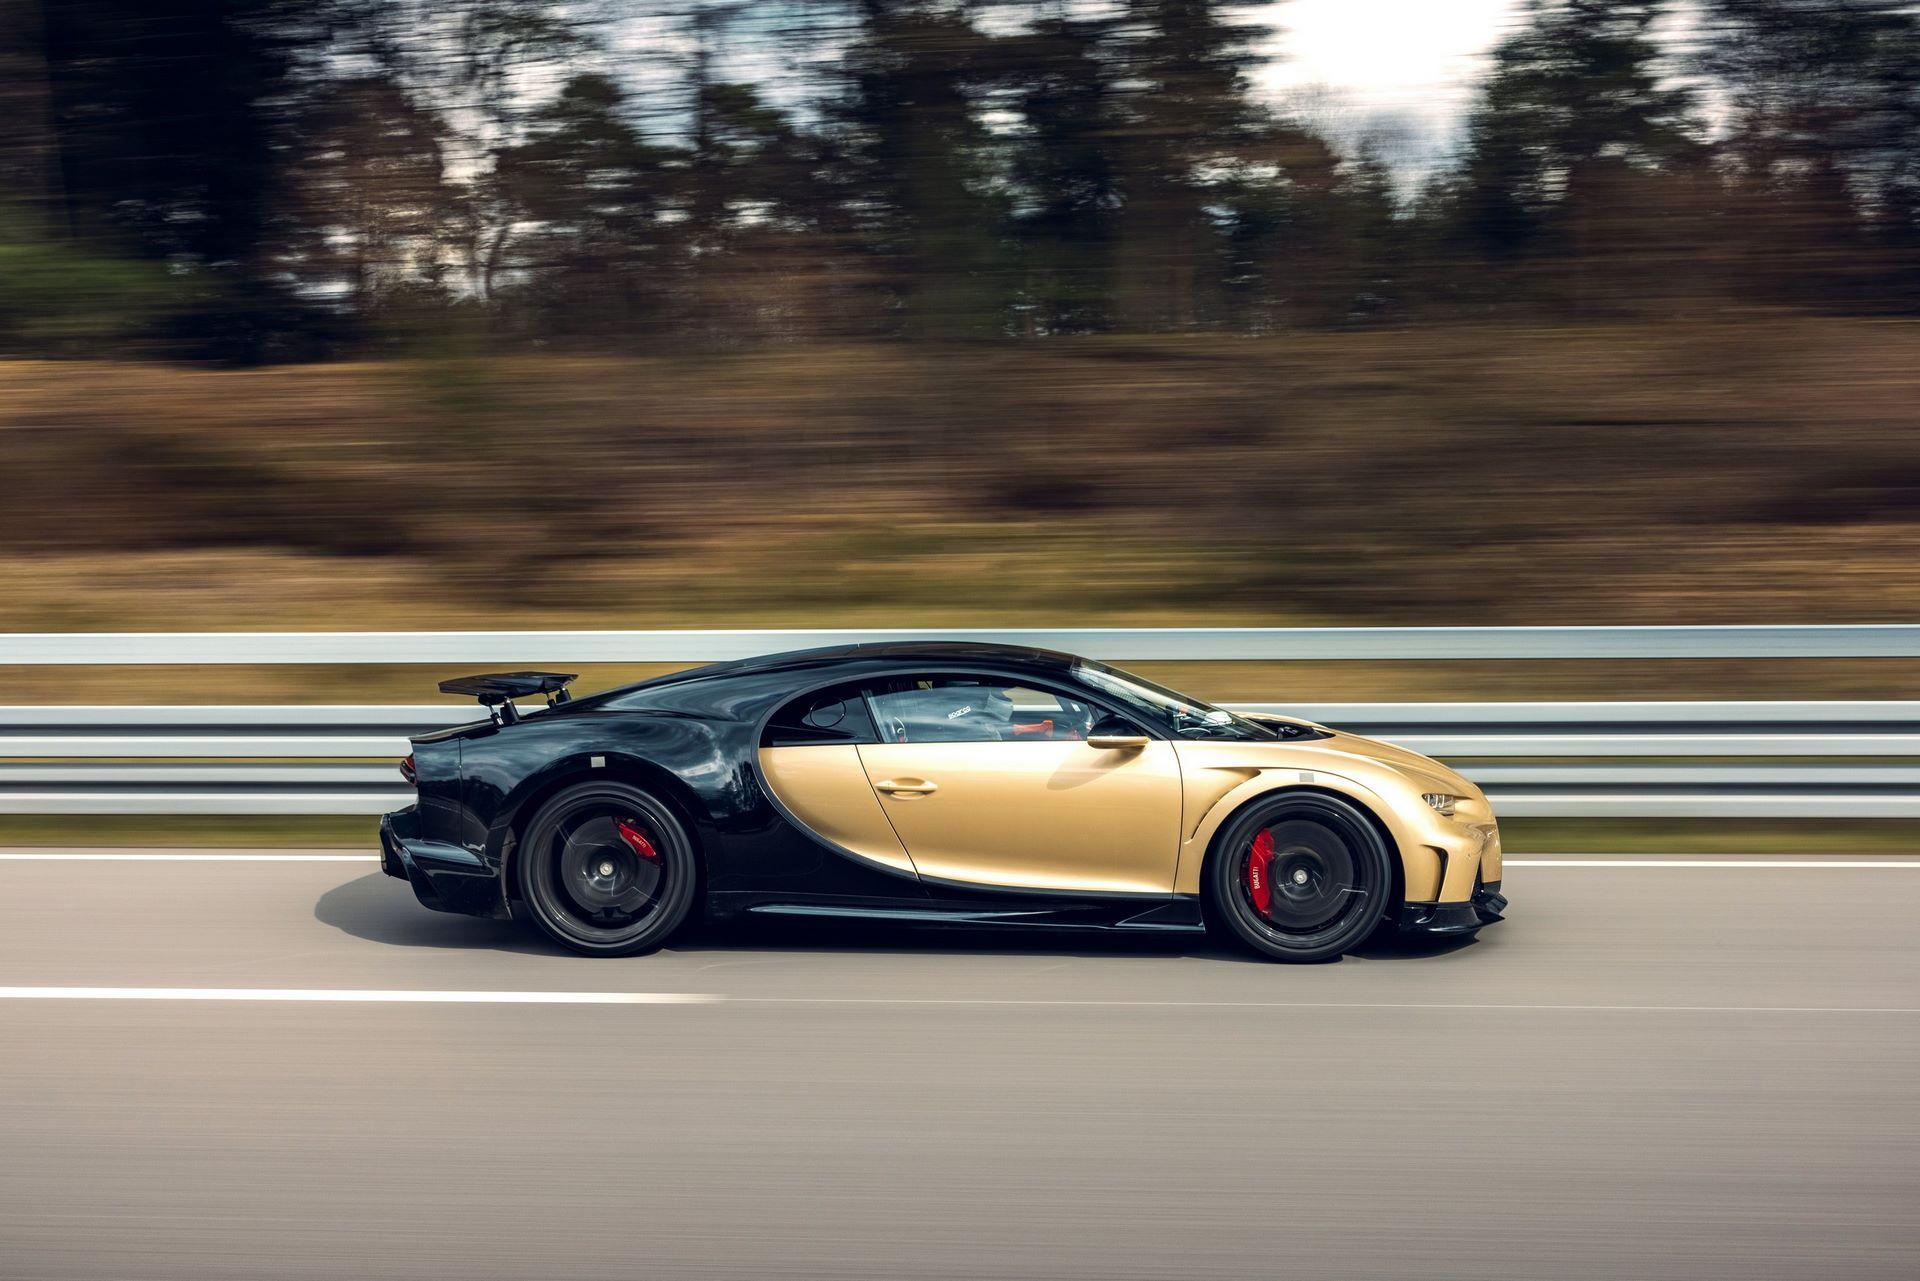 Bugatti-Chiron-Super-Sport-testing-4